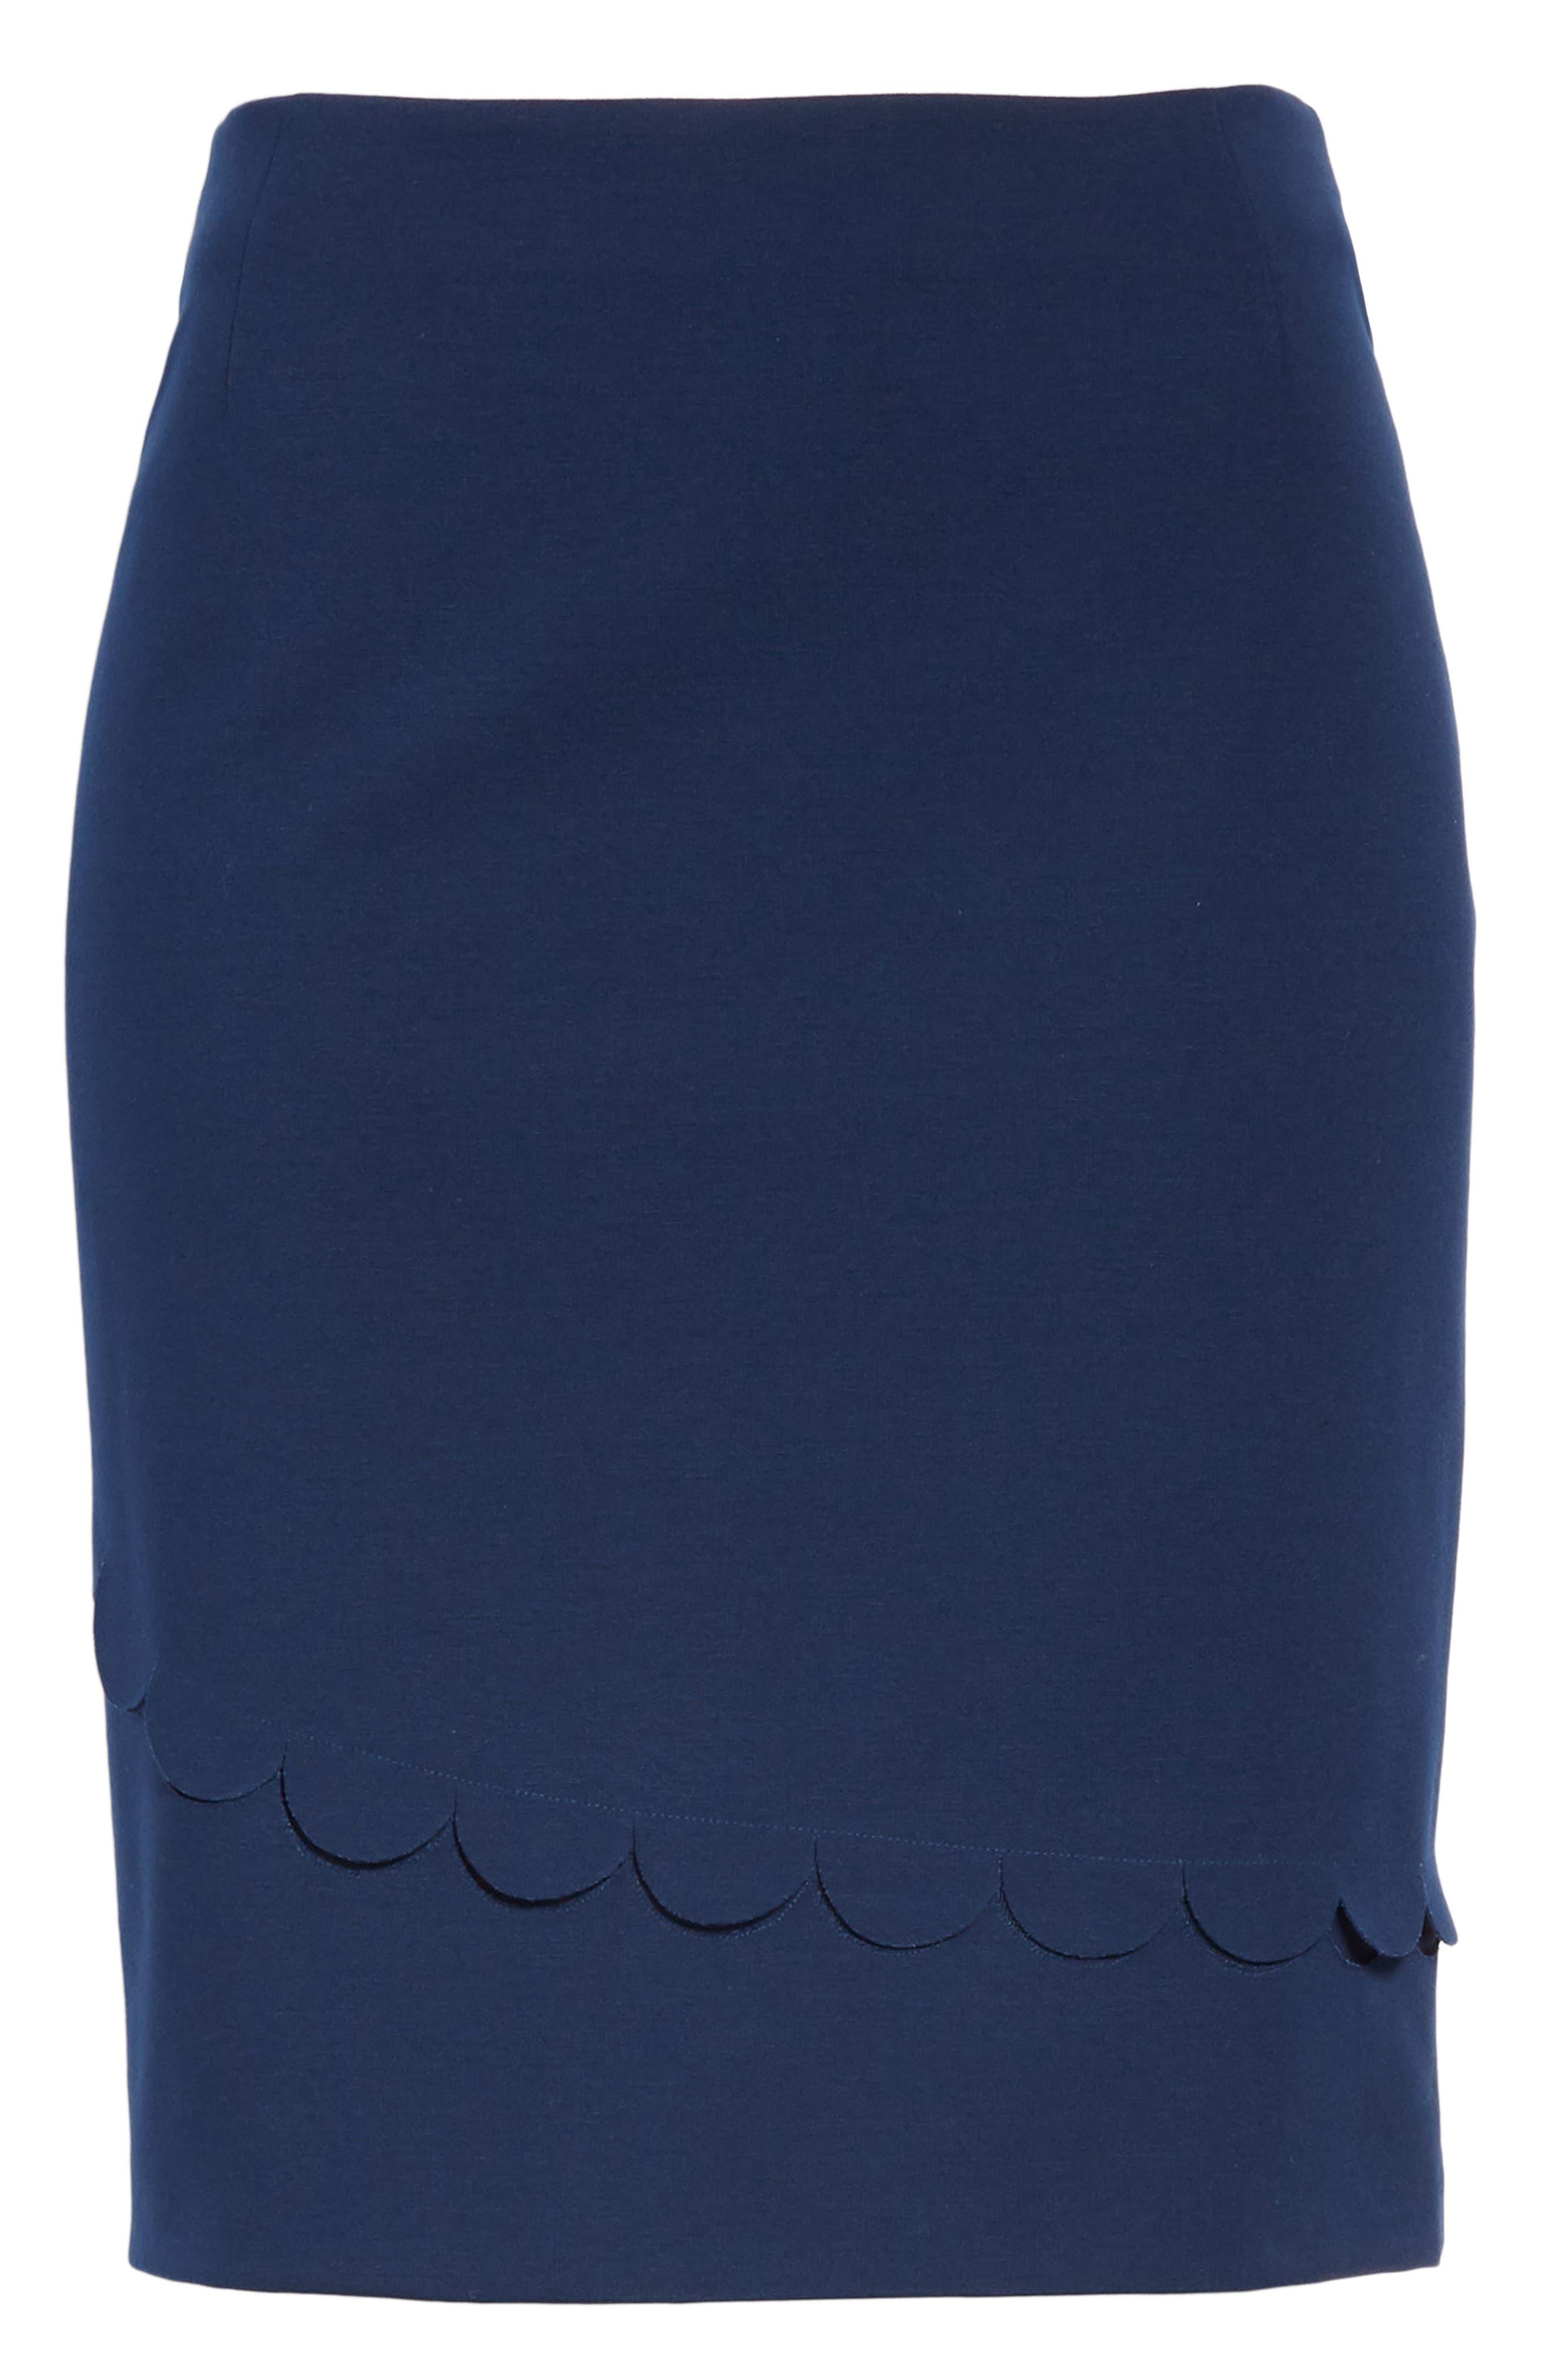 AKRIS PUNTO,                             Scallop Detail Miniskirt,                             Alternate thumbnail 3, color,                             BLU MARE